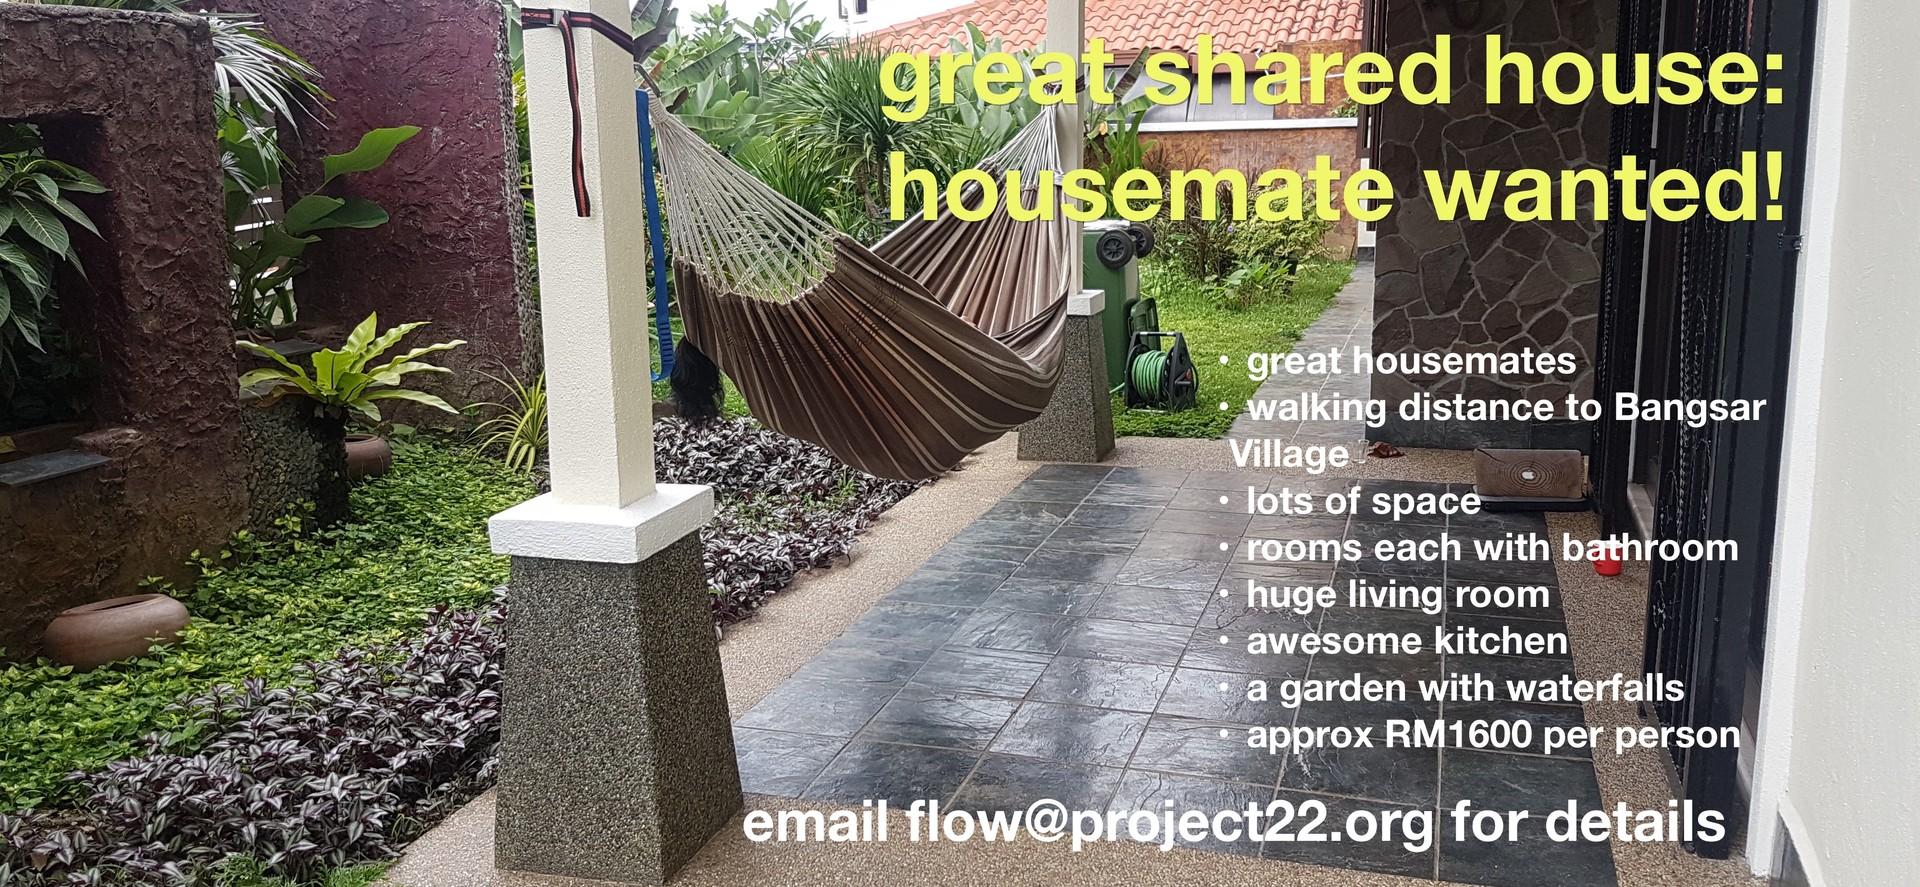 cool-house-bangsar-needs-1-2-housemates-4d39c3d1ac3ccc25b281b71c21452fca